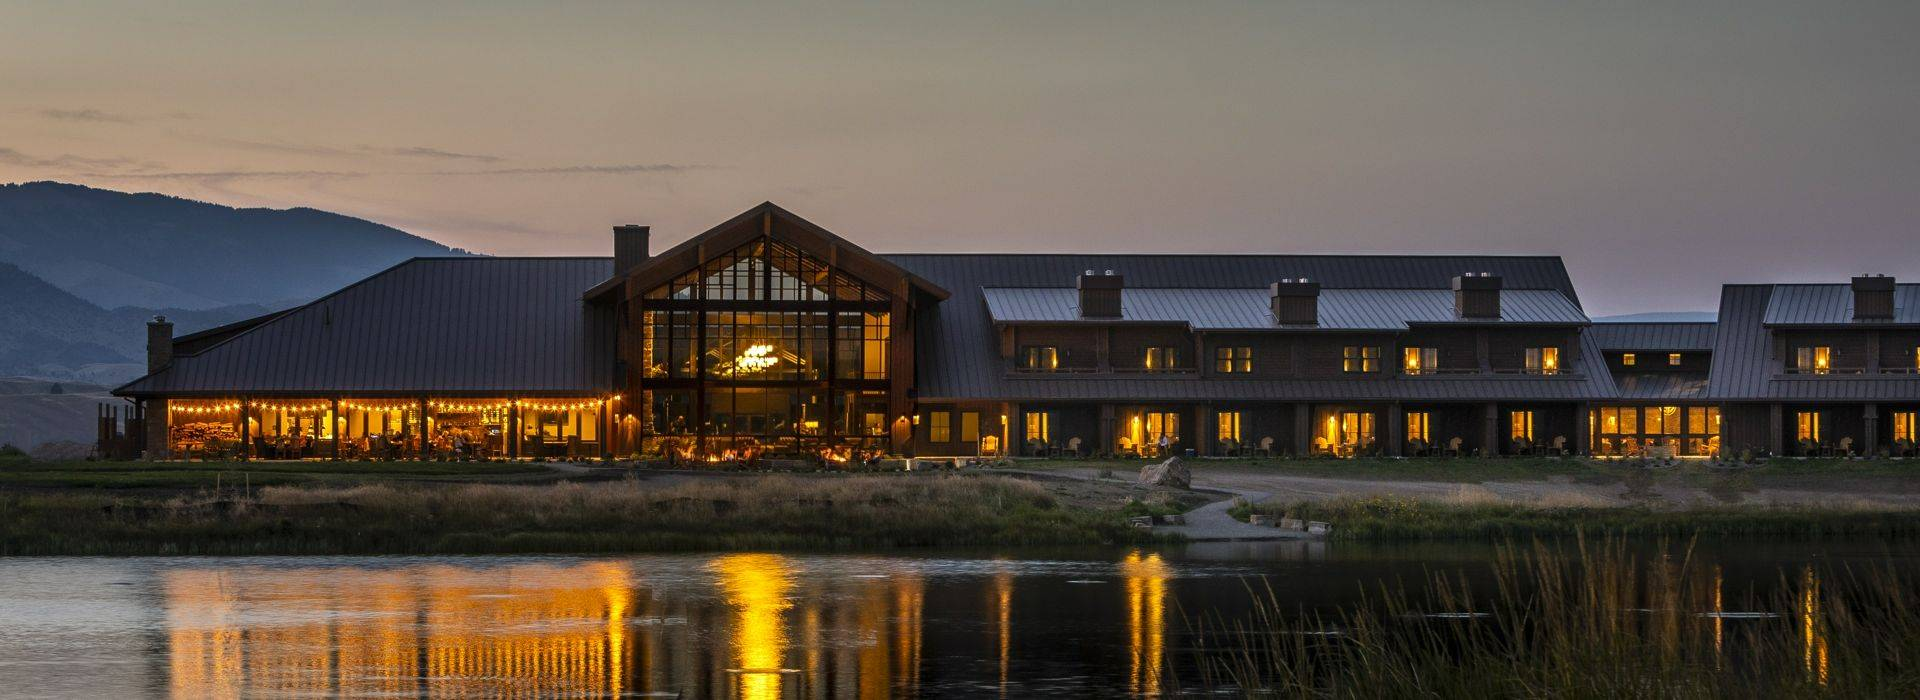 Sage-Lodge-Exterior Overlooking Pond at Dusk.jpg